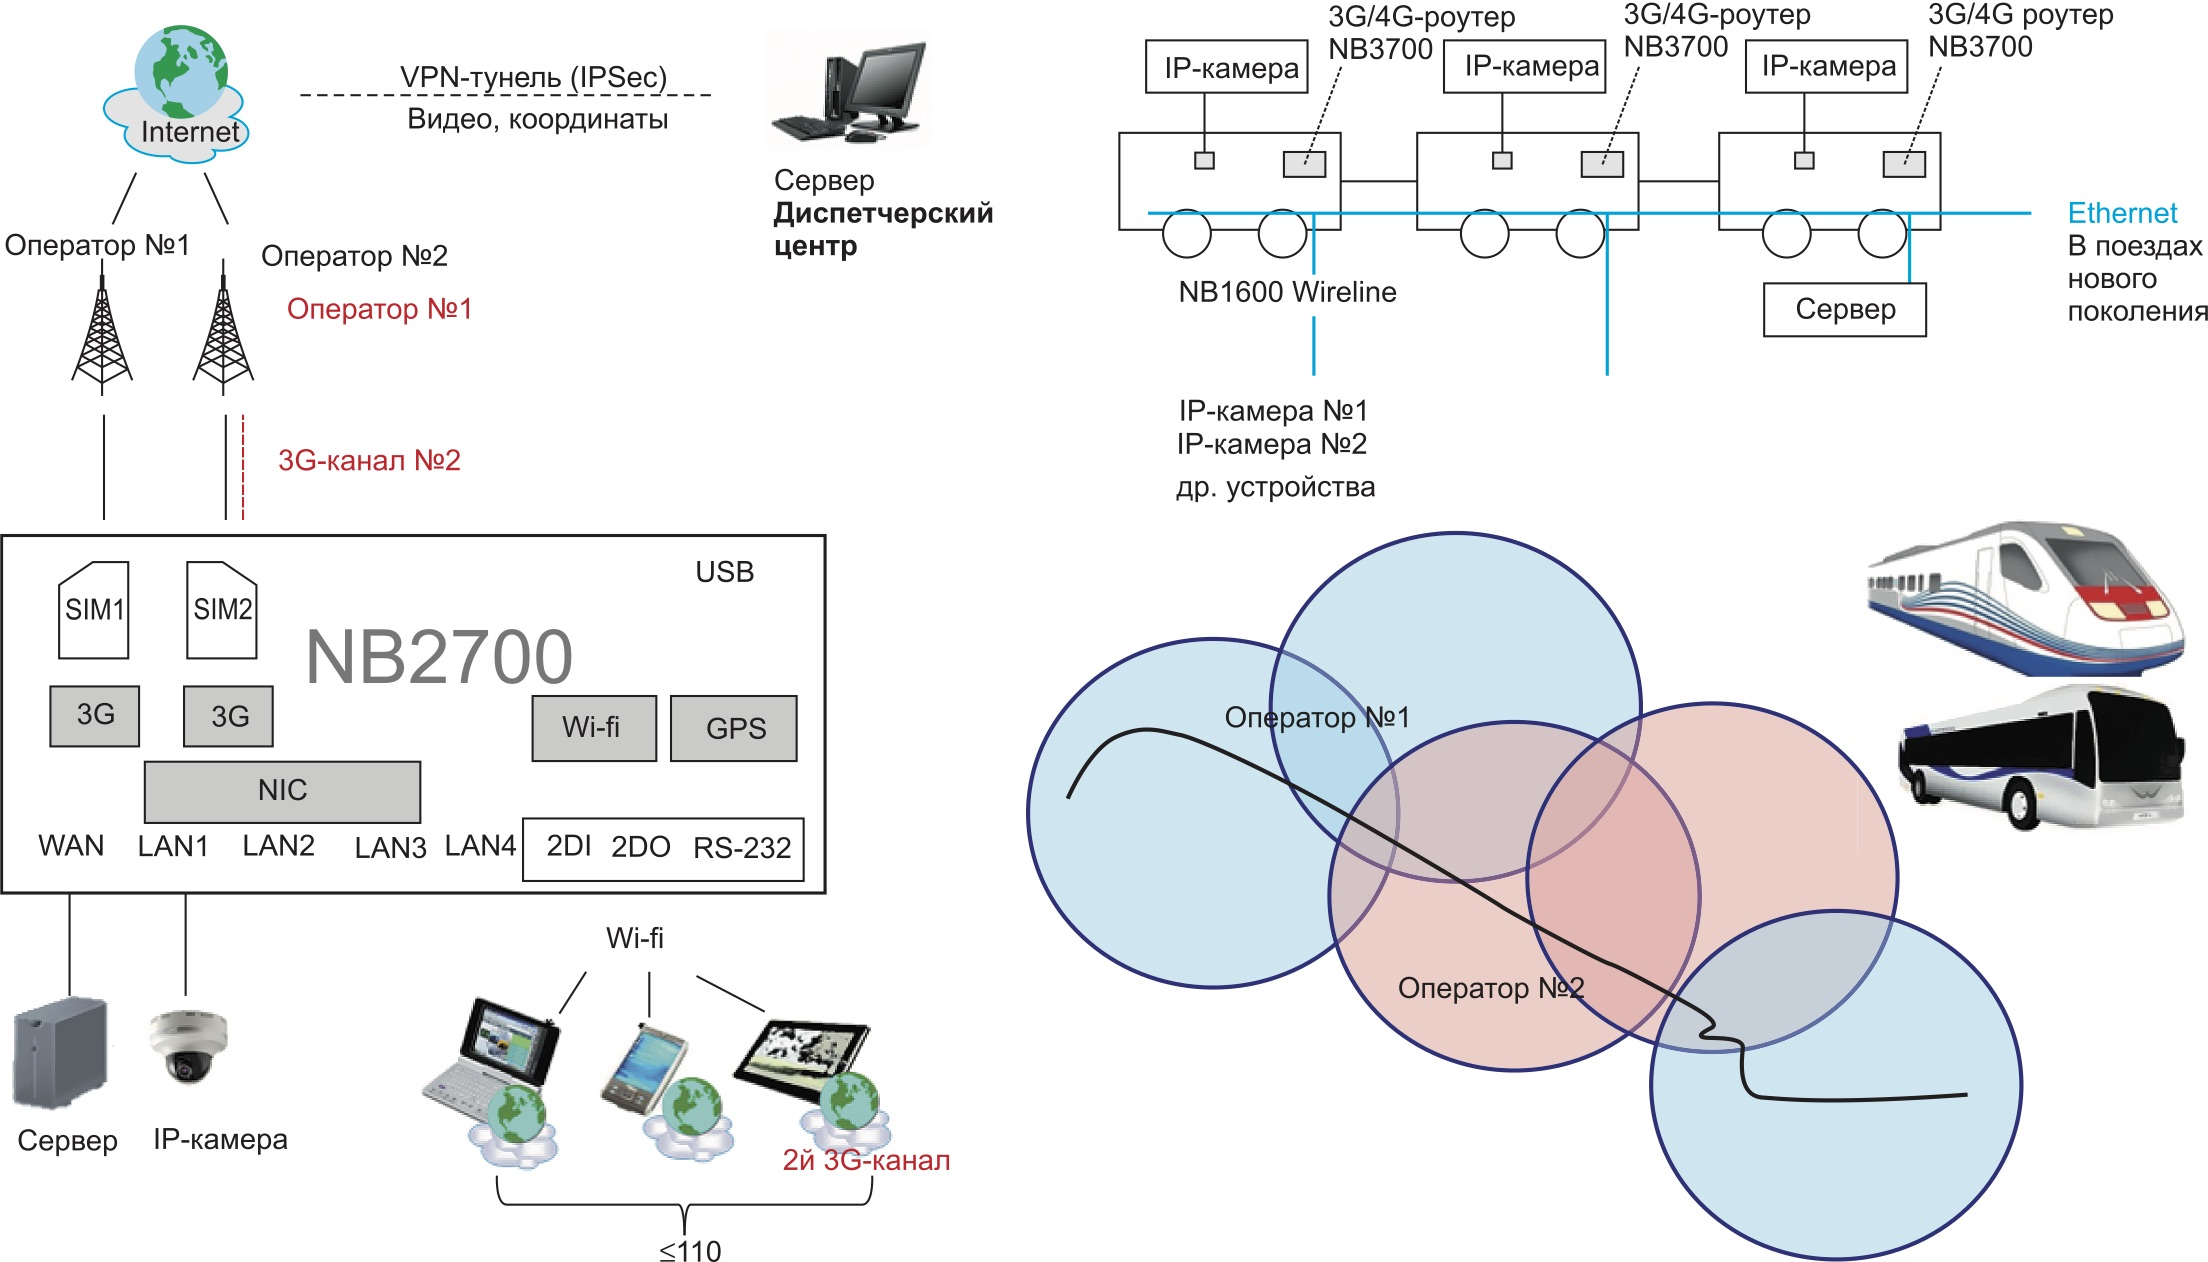 3G/LTE/Wi-Fi-роутеры NB2700/3700 на транспорте